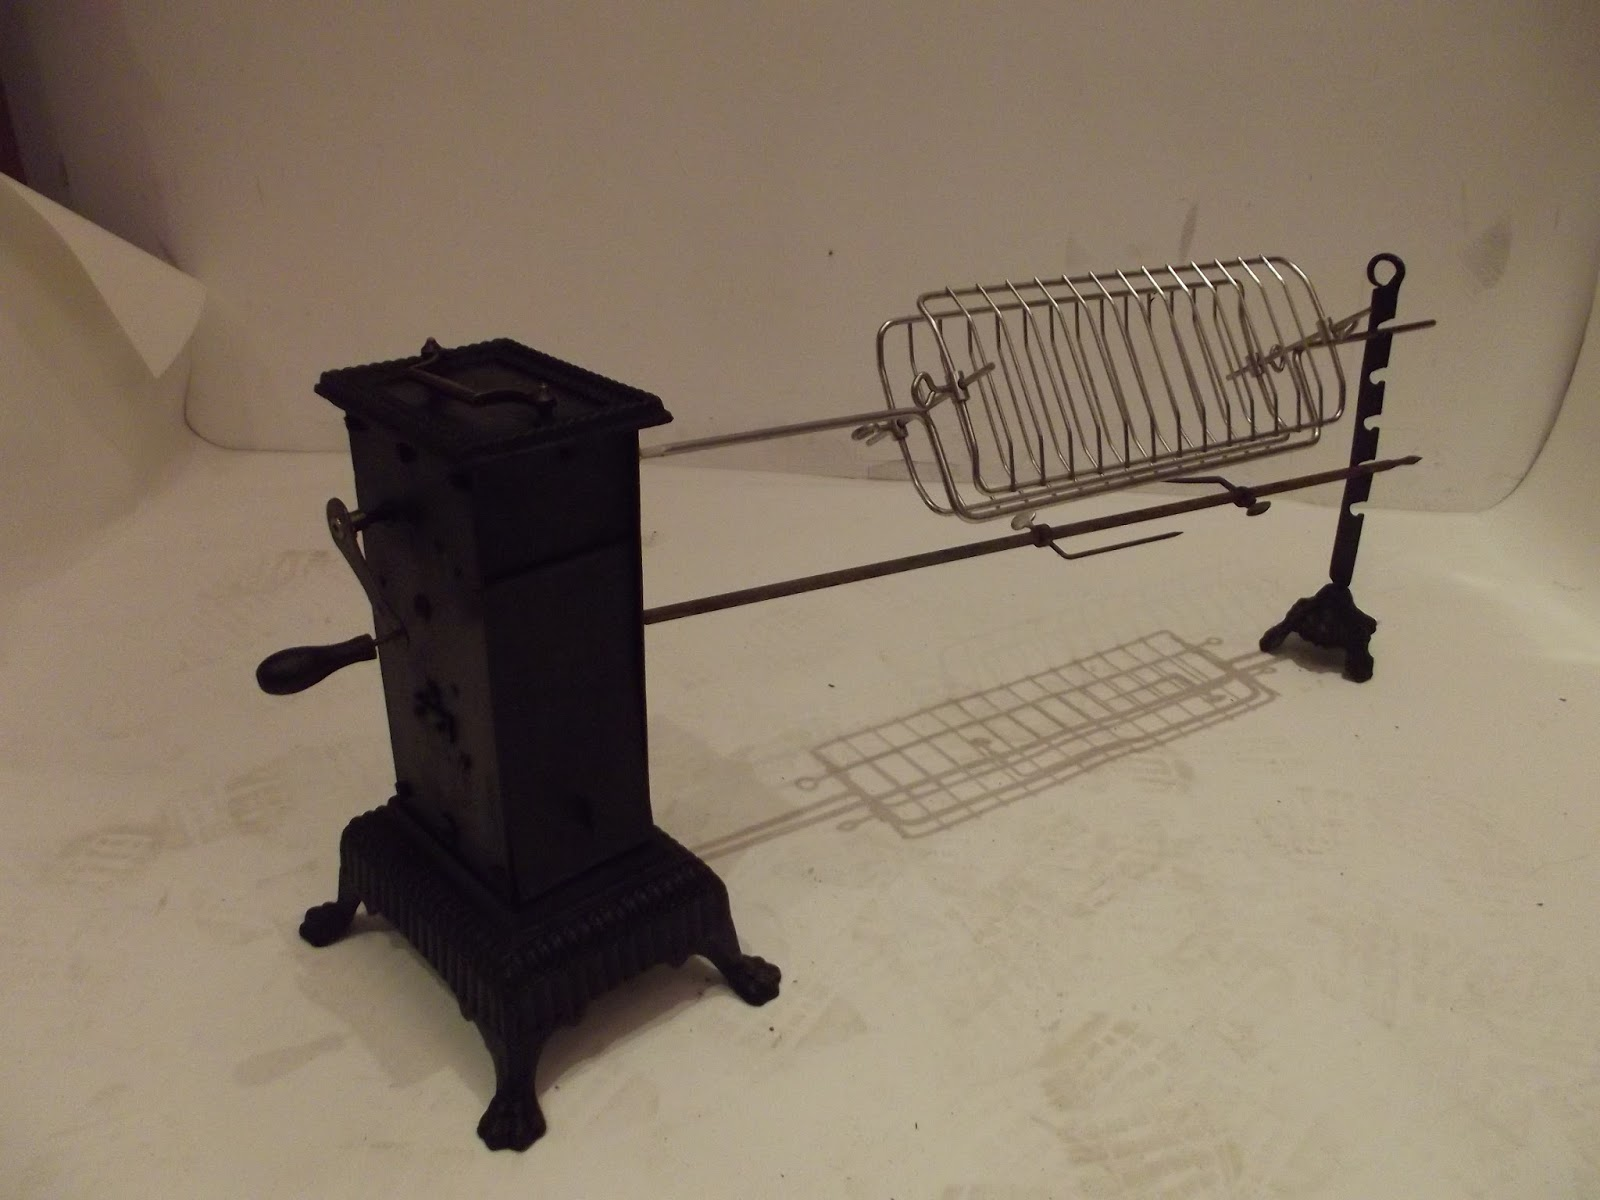 tourne broche pour grillades et. Black Bedroom Furniture Sets. Home Design Ideas